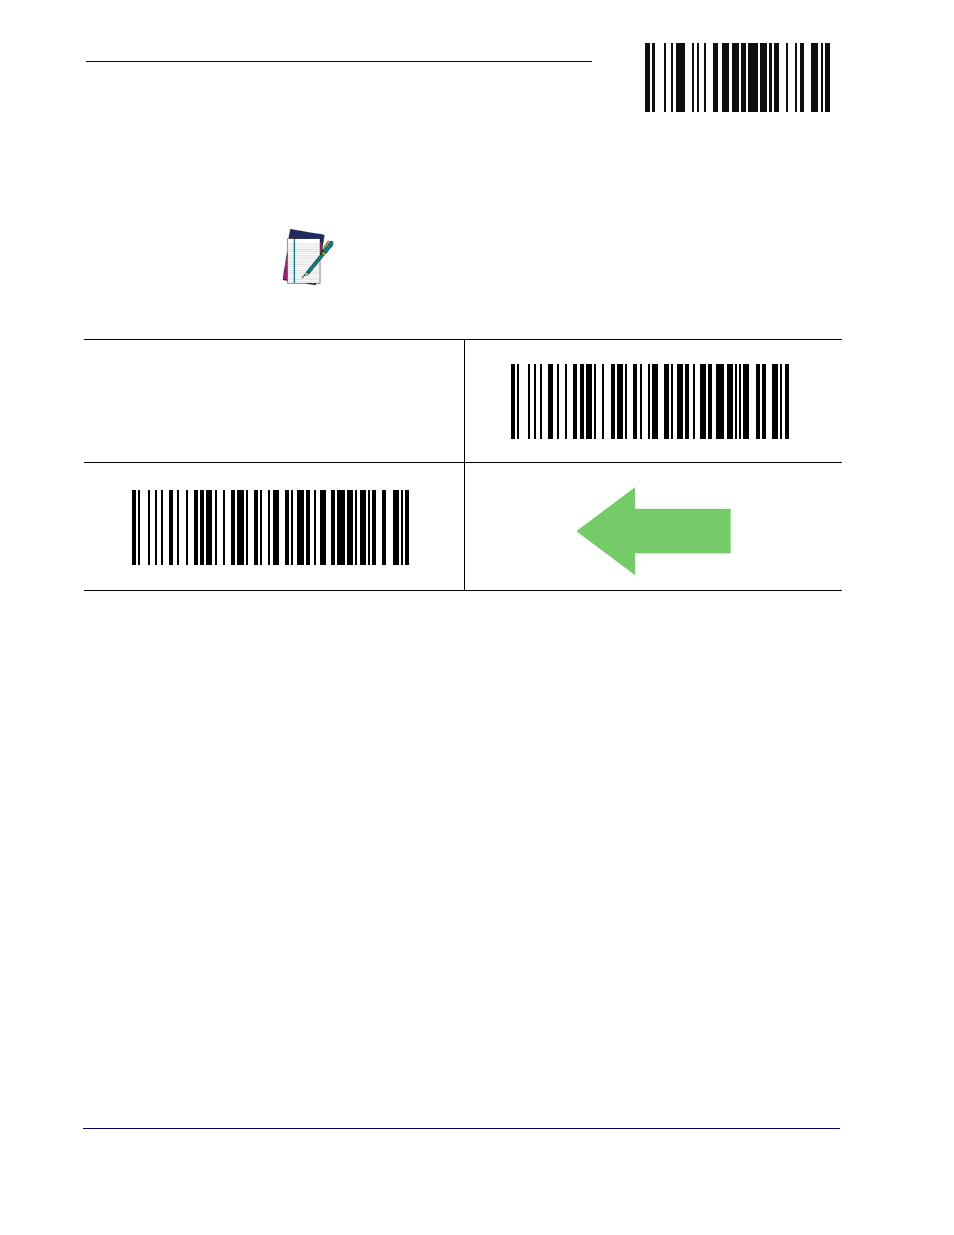 datalogic quickscan lite qw2100 usb driver